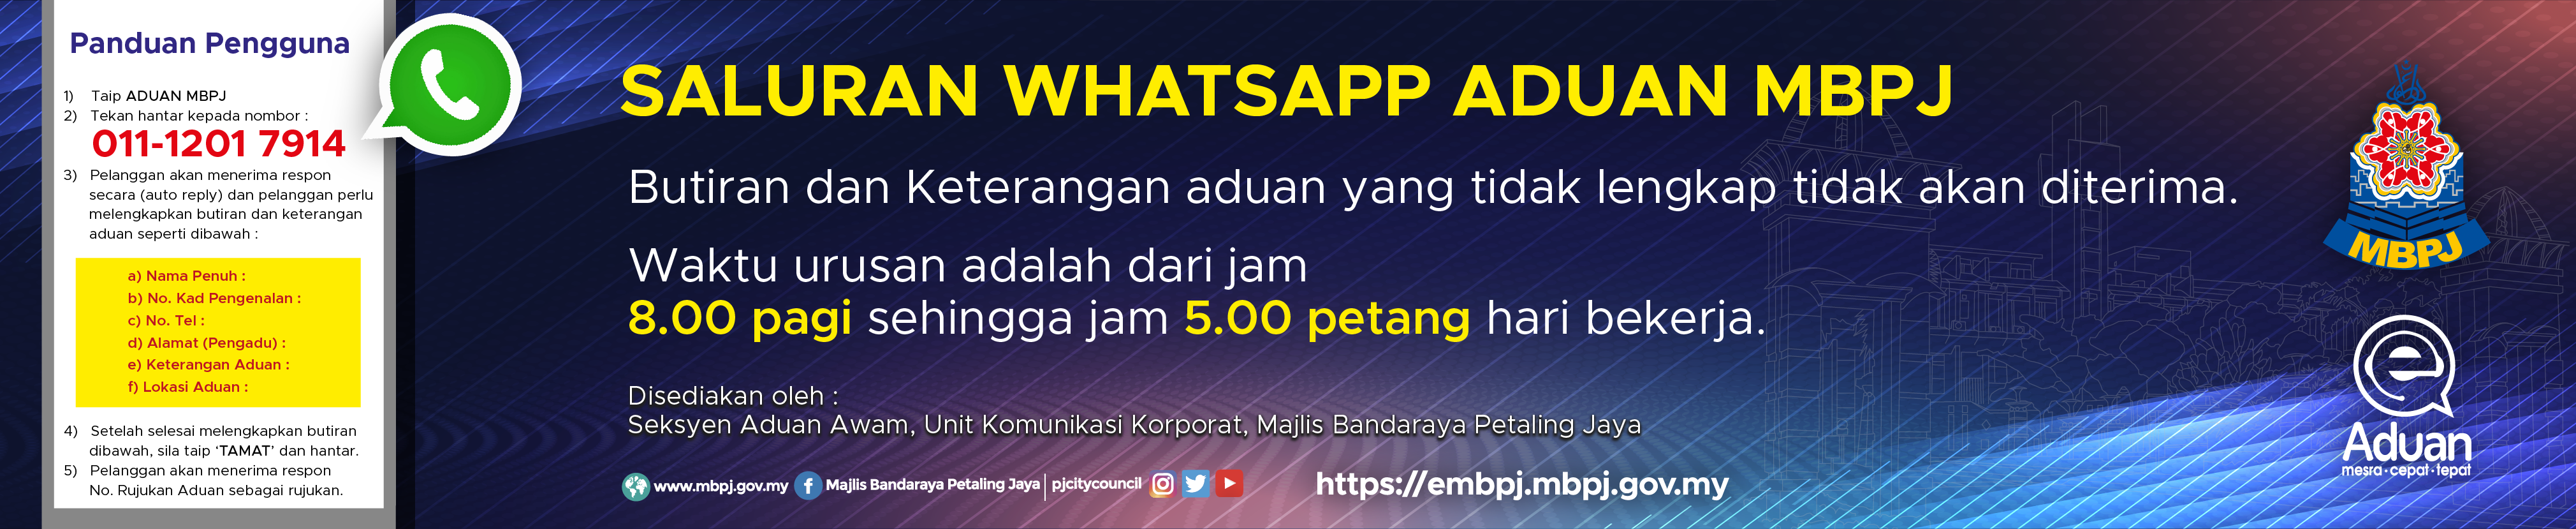 Banner Aduan Melalui Whatsapp